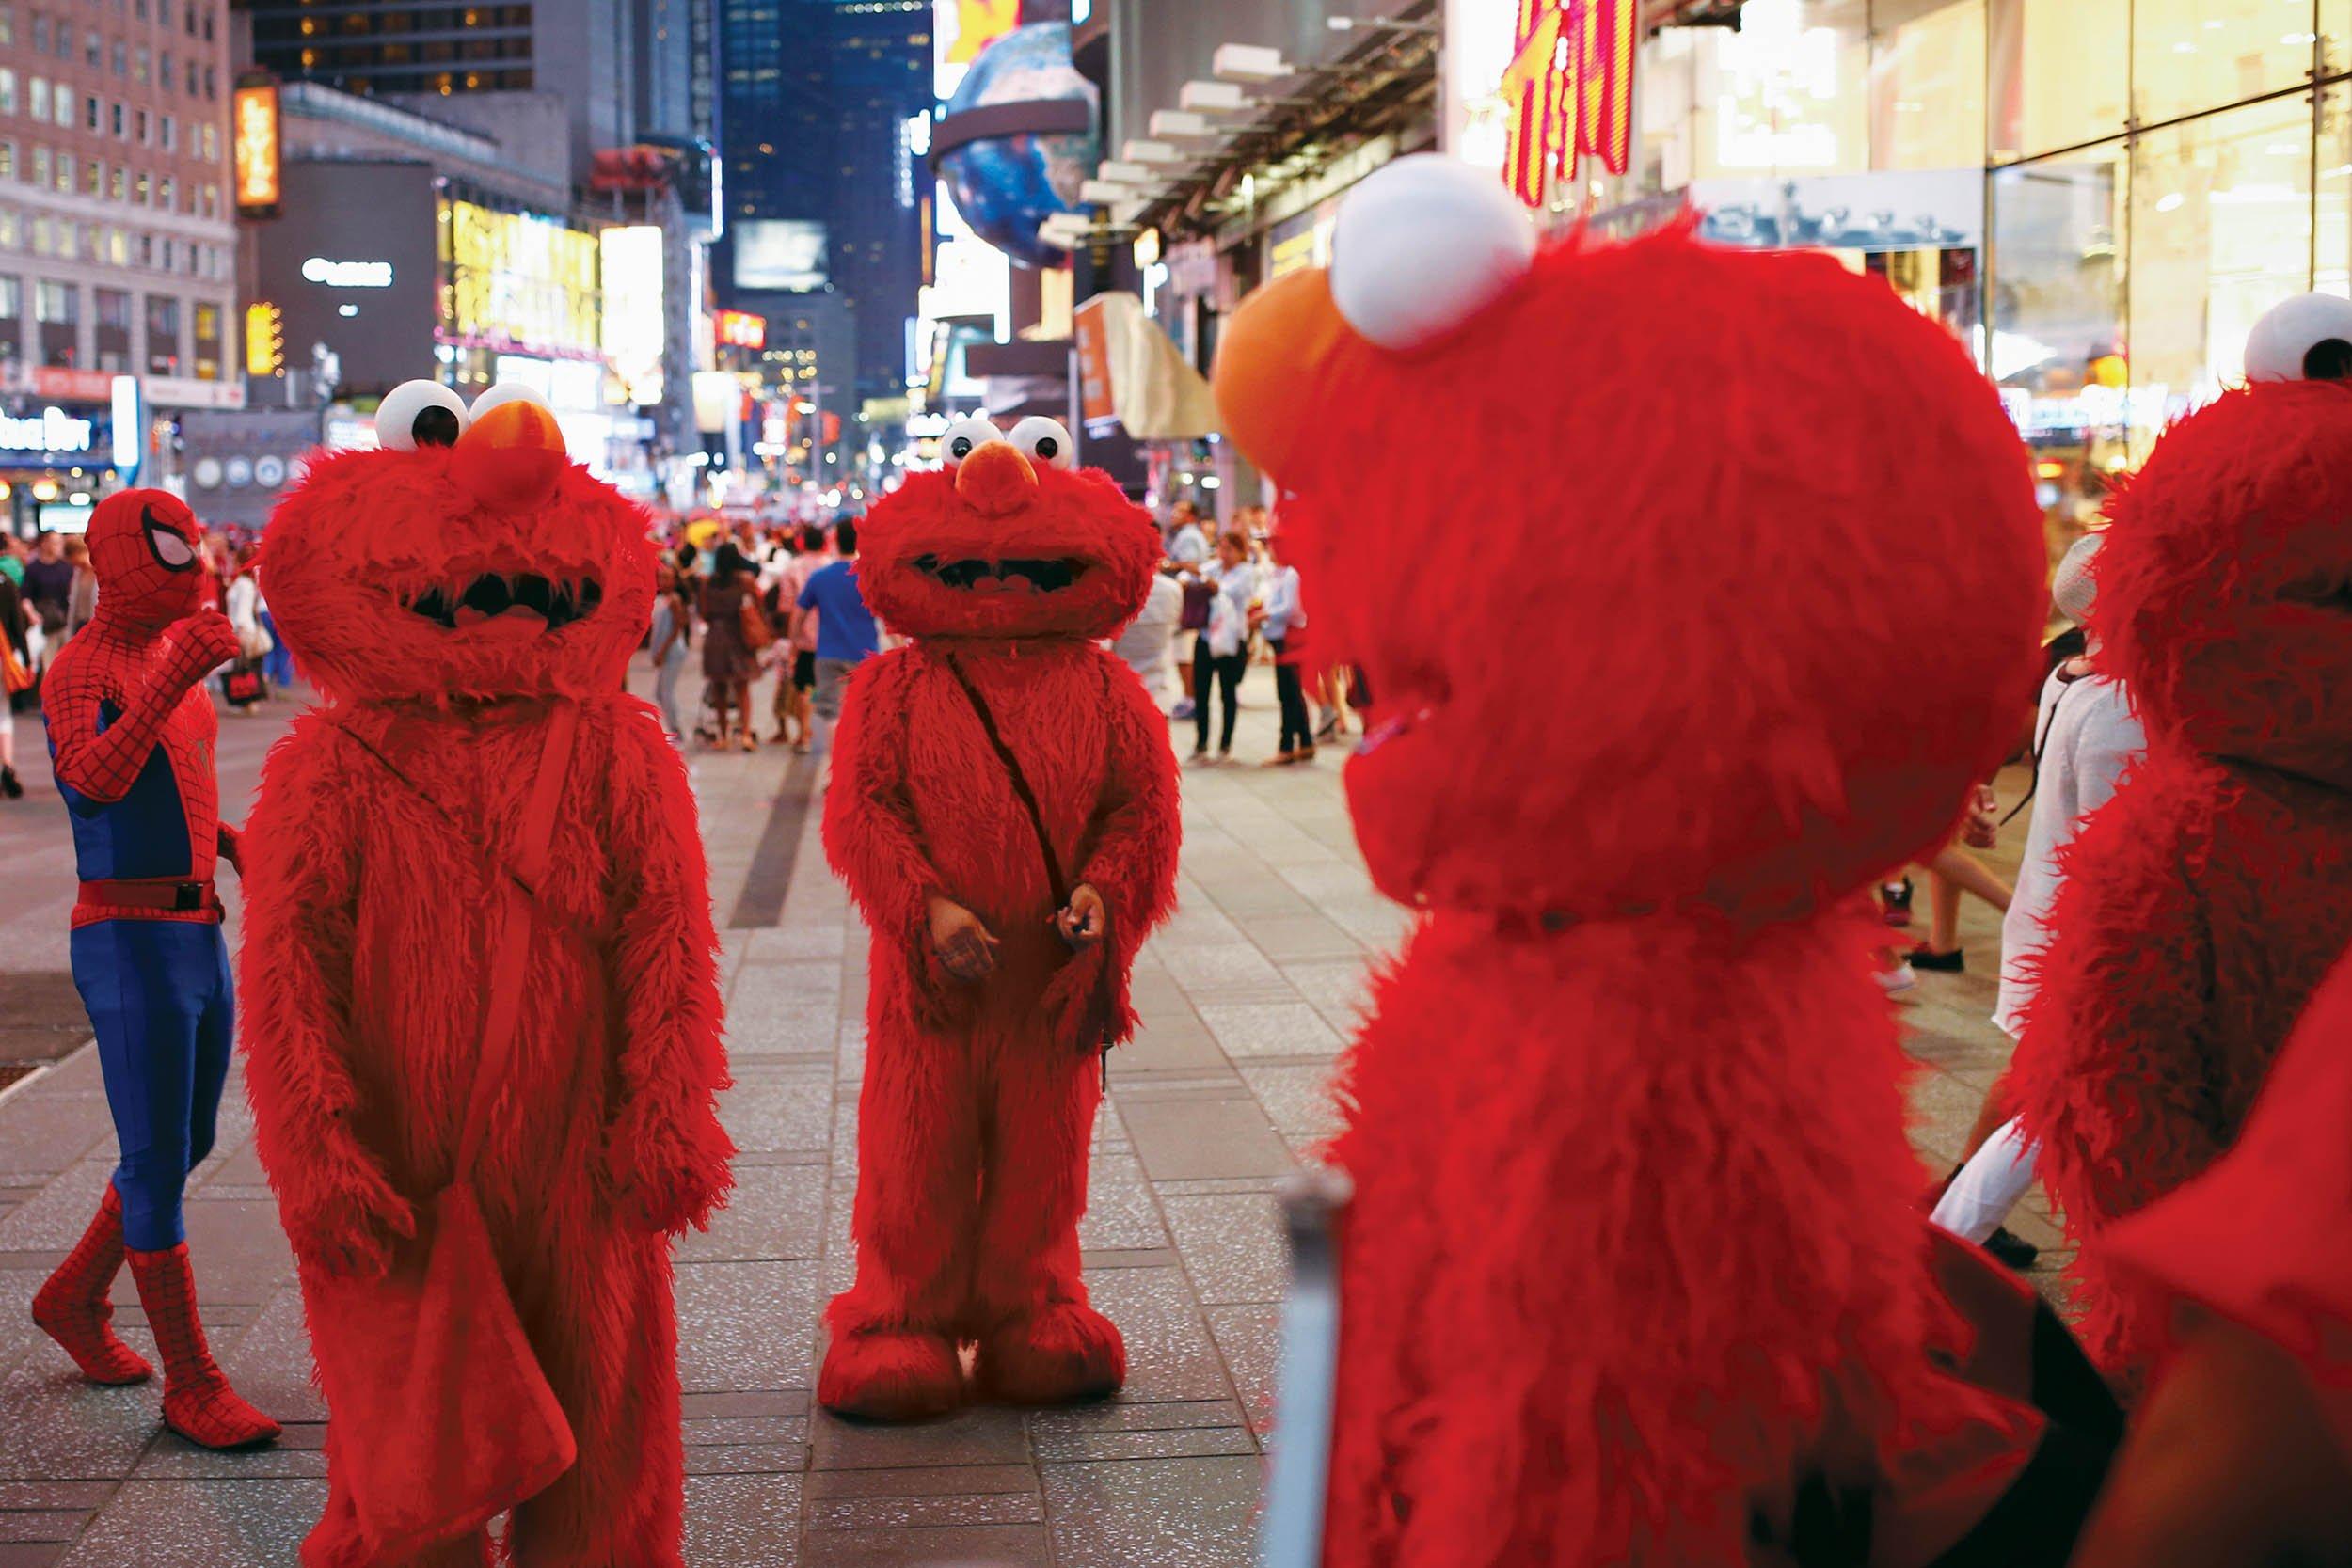 St. Elmo's Fired